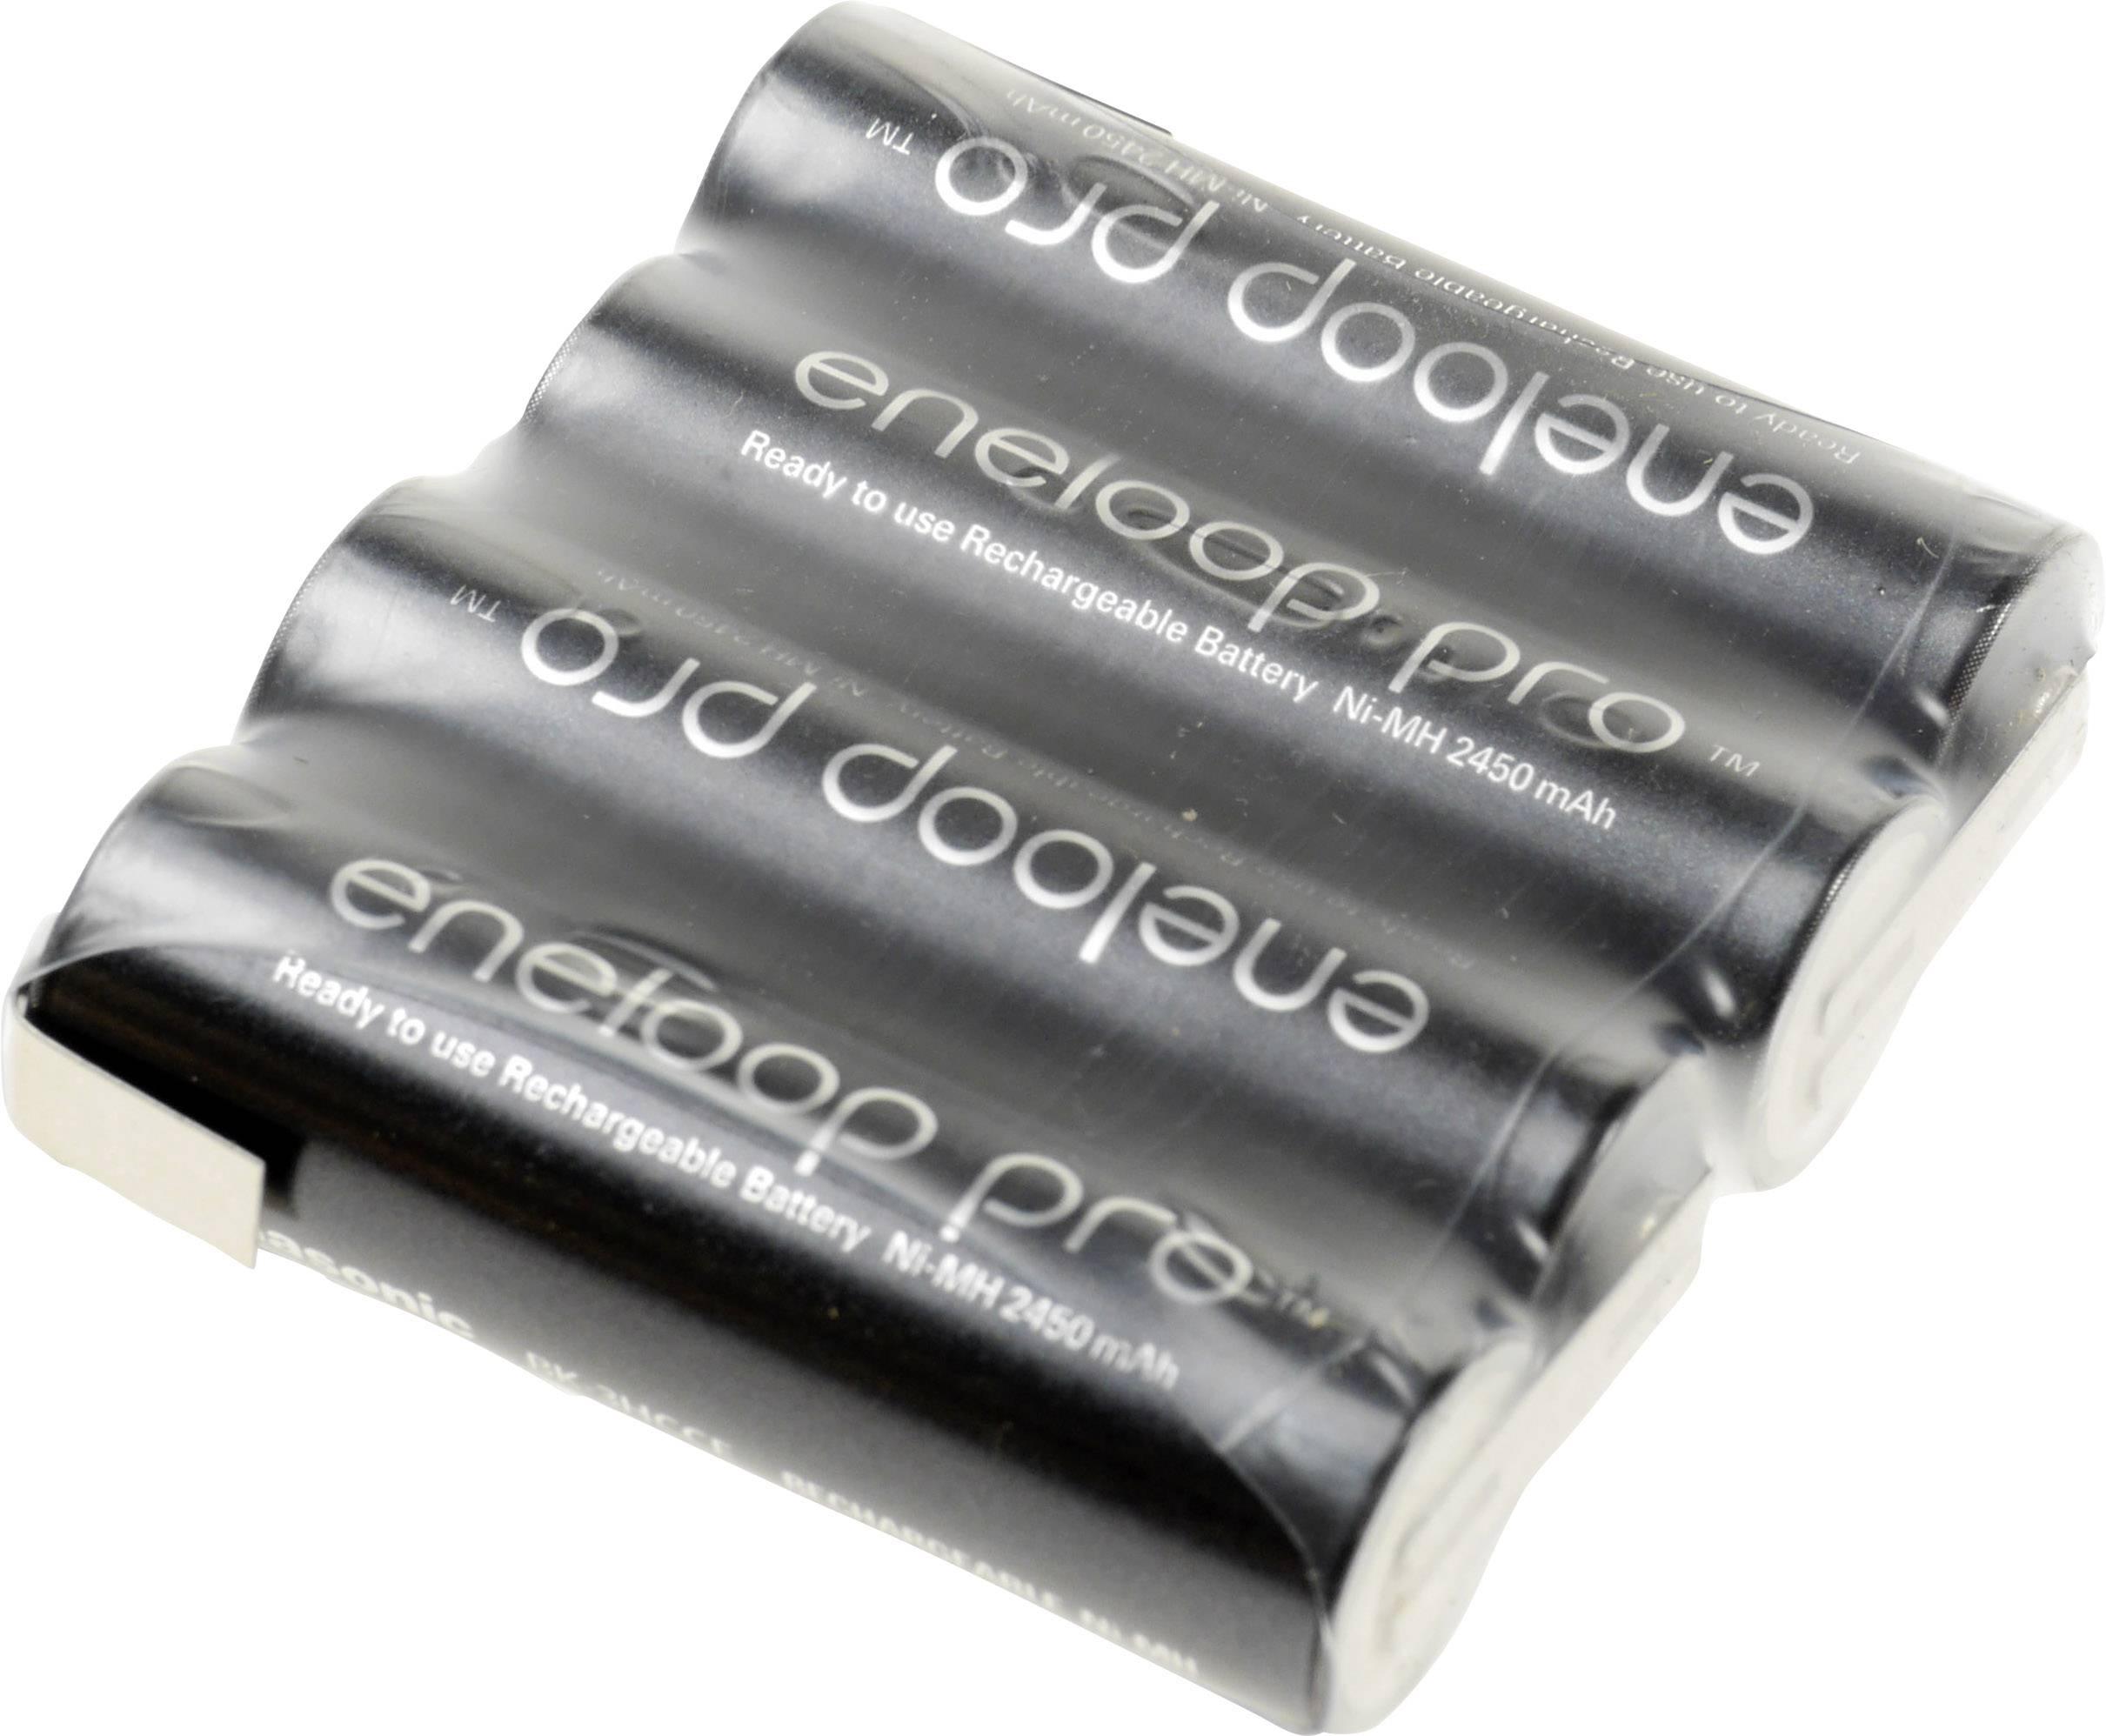 Akupack - sada nabíjacích batérií NiMH 4 mignon (AA) Panasonic eneloop Pro Reihe F1x4 134282, 2450 mAh, 4.8 V